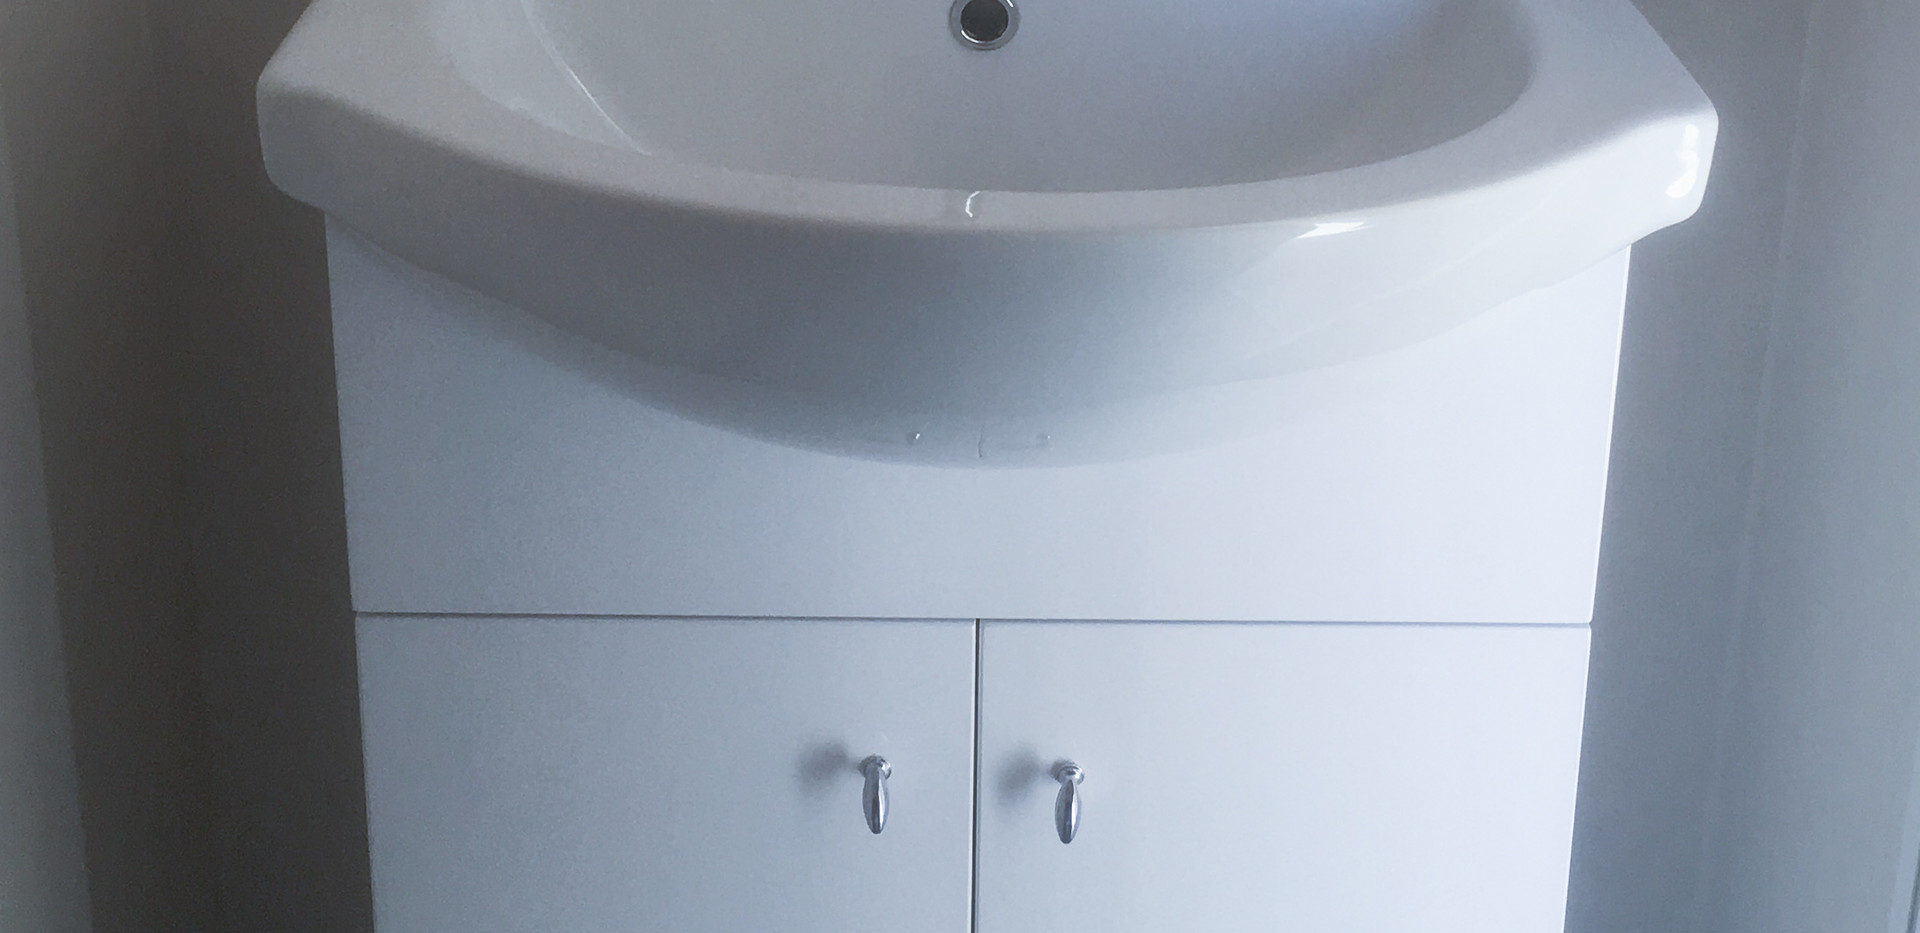 lavamanos farmacia movil.jpg